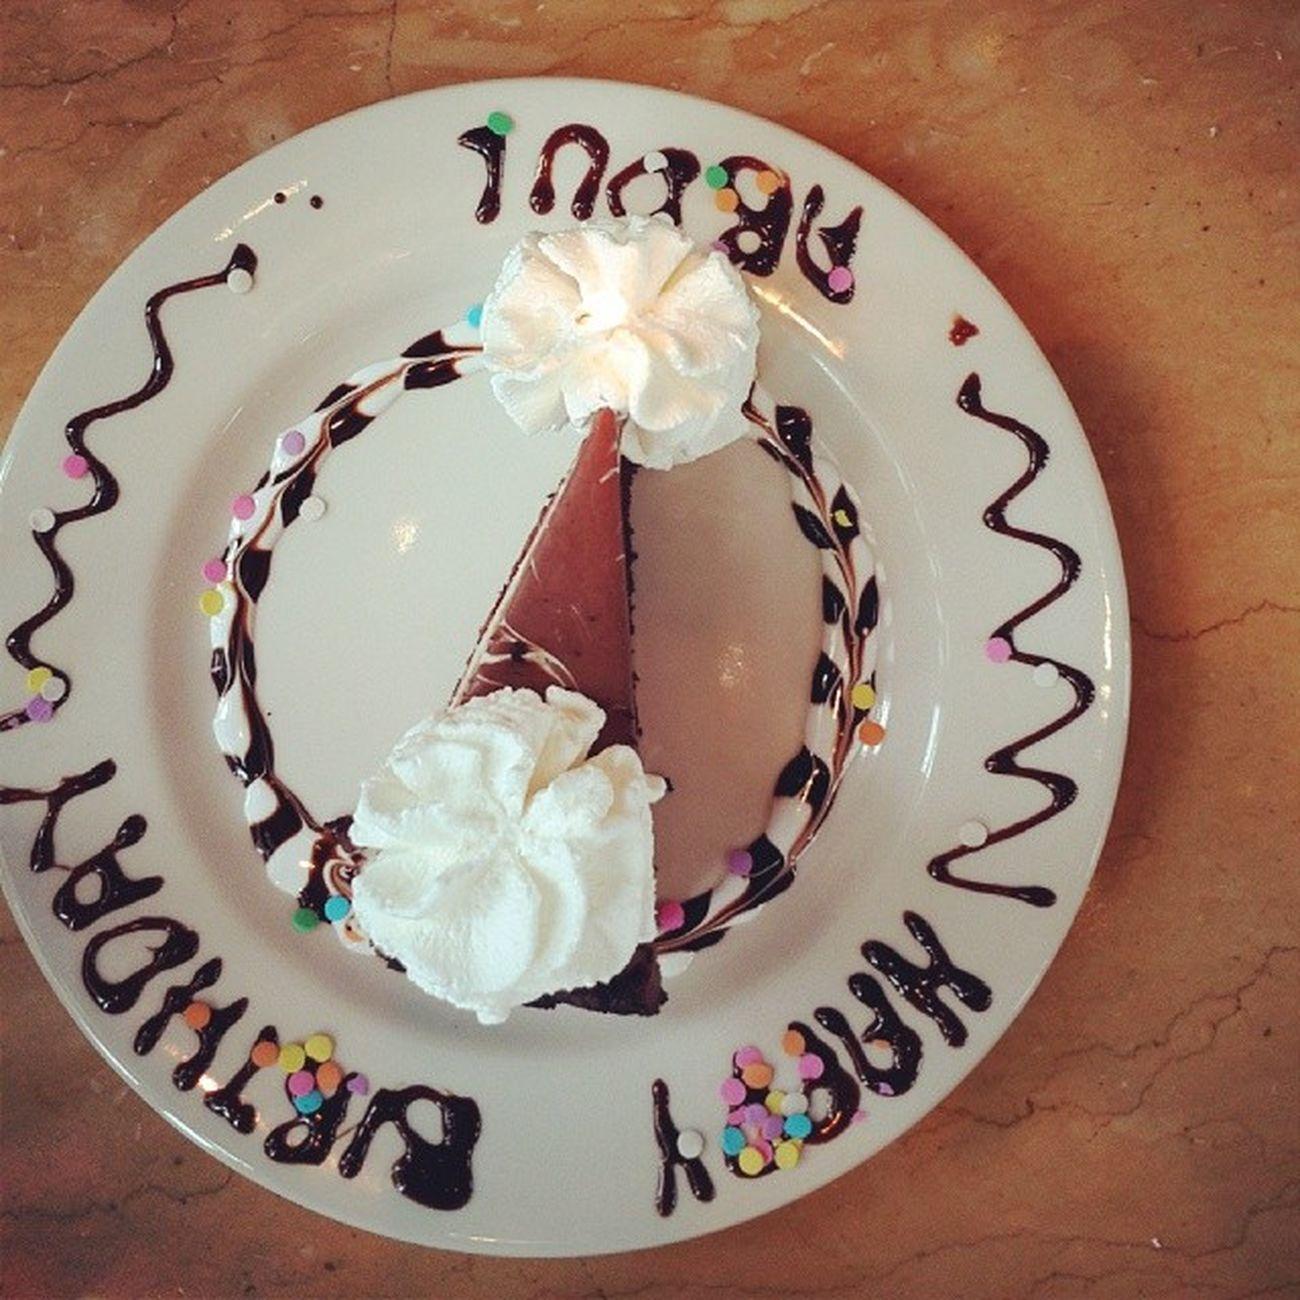 Happy Birthday Bro Cake cheesecakefactory cheese _cake cleveland ohio oh euclid us usa كليفلايند اوهايو امريكا عدستي يومياتي المصورون_العرب تصويري ذكريات مبتعث احتراف food